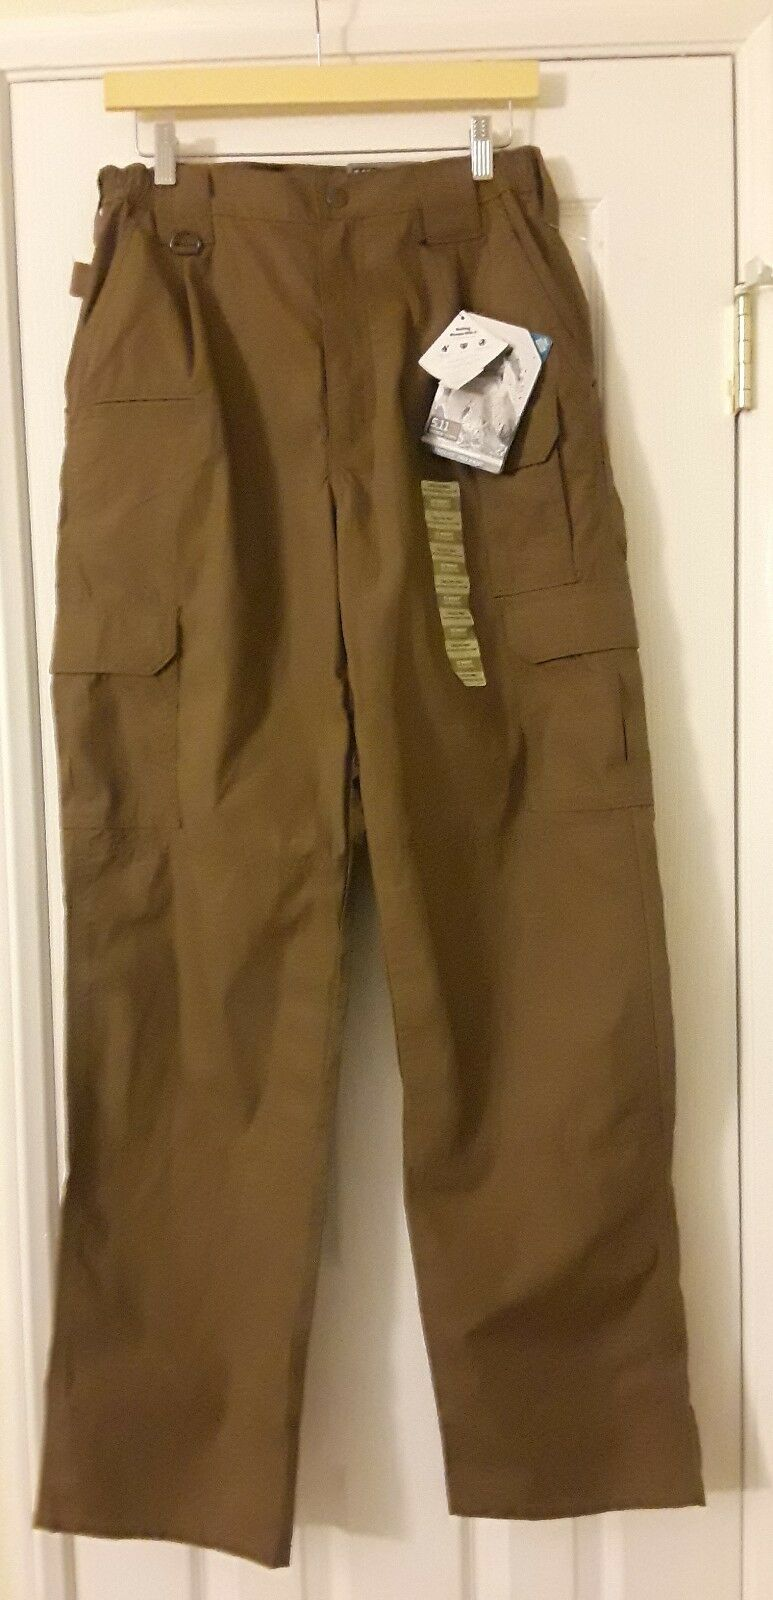 Men 5.11 Tactical Series Taclite Pro Pants Brown 32X34